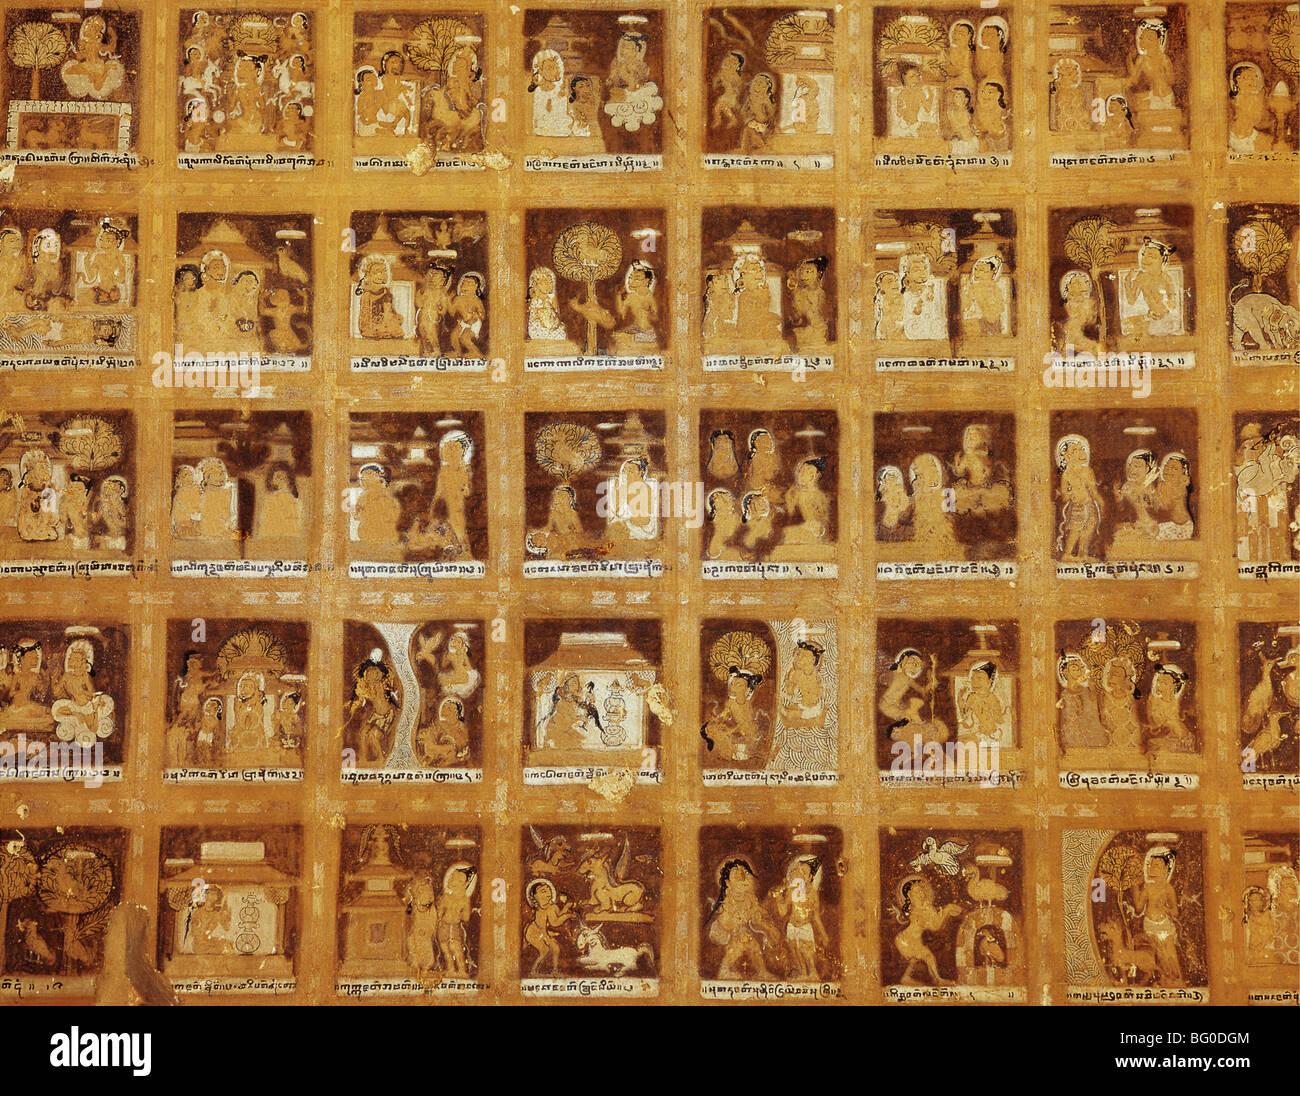 Jataka Szenen an der Decke im Kubyauk Gyi (Wetkyi-In), Bagan (Pagan), Myanmar (Burma), Asien Stockbild